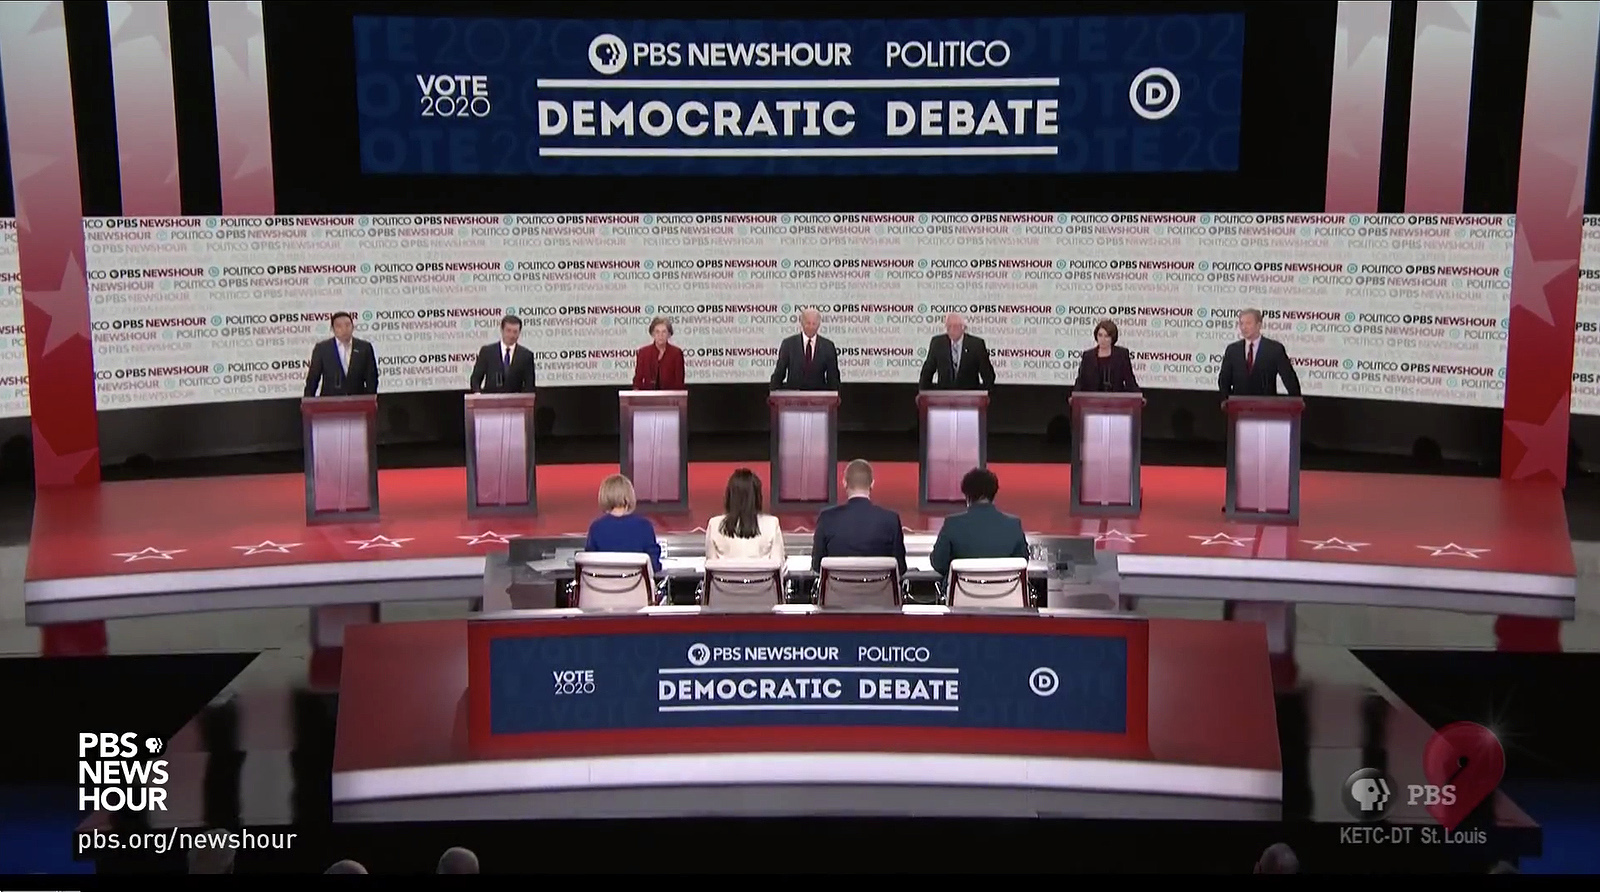 NCS_PBS-NewsHour_Politico_Democratic-Debate_007